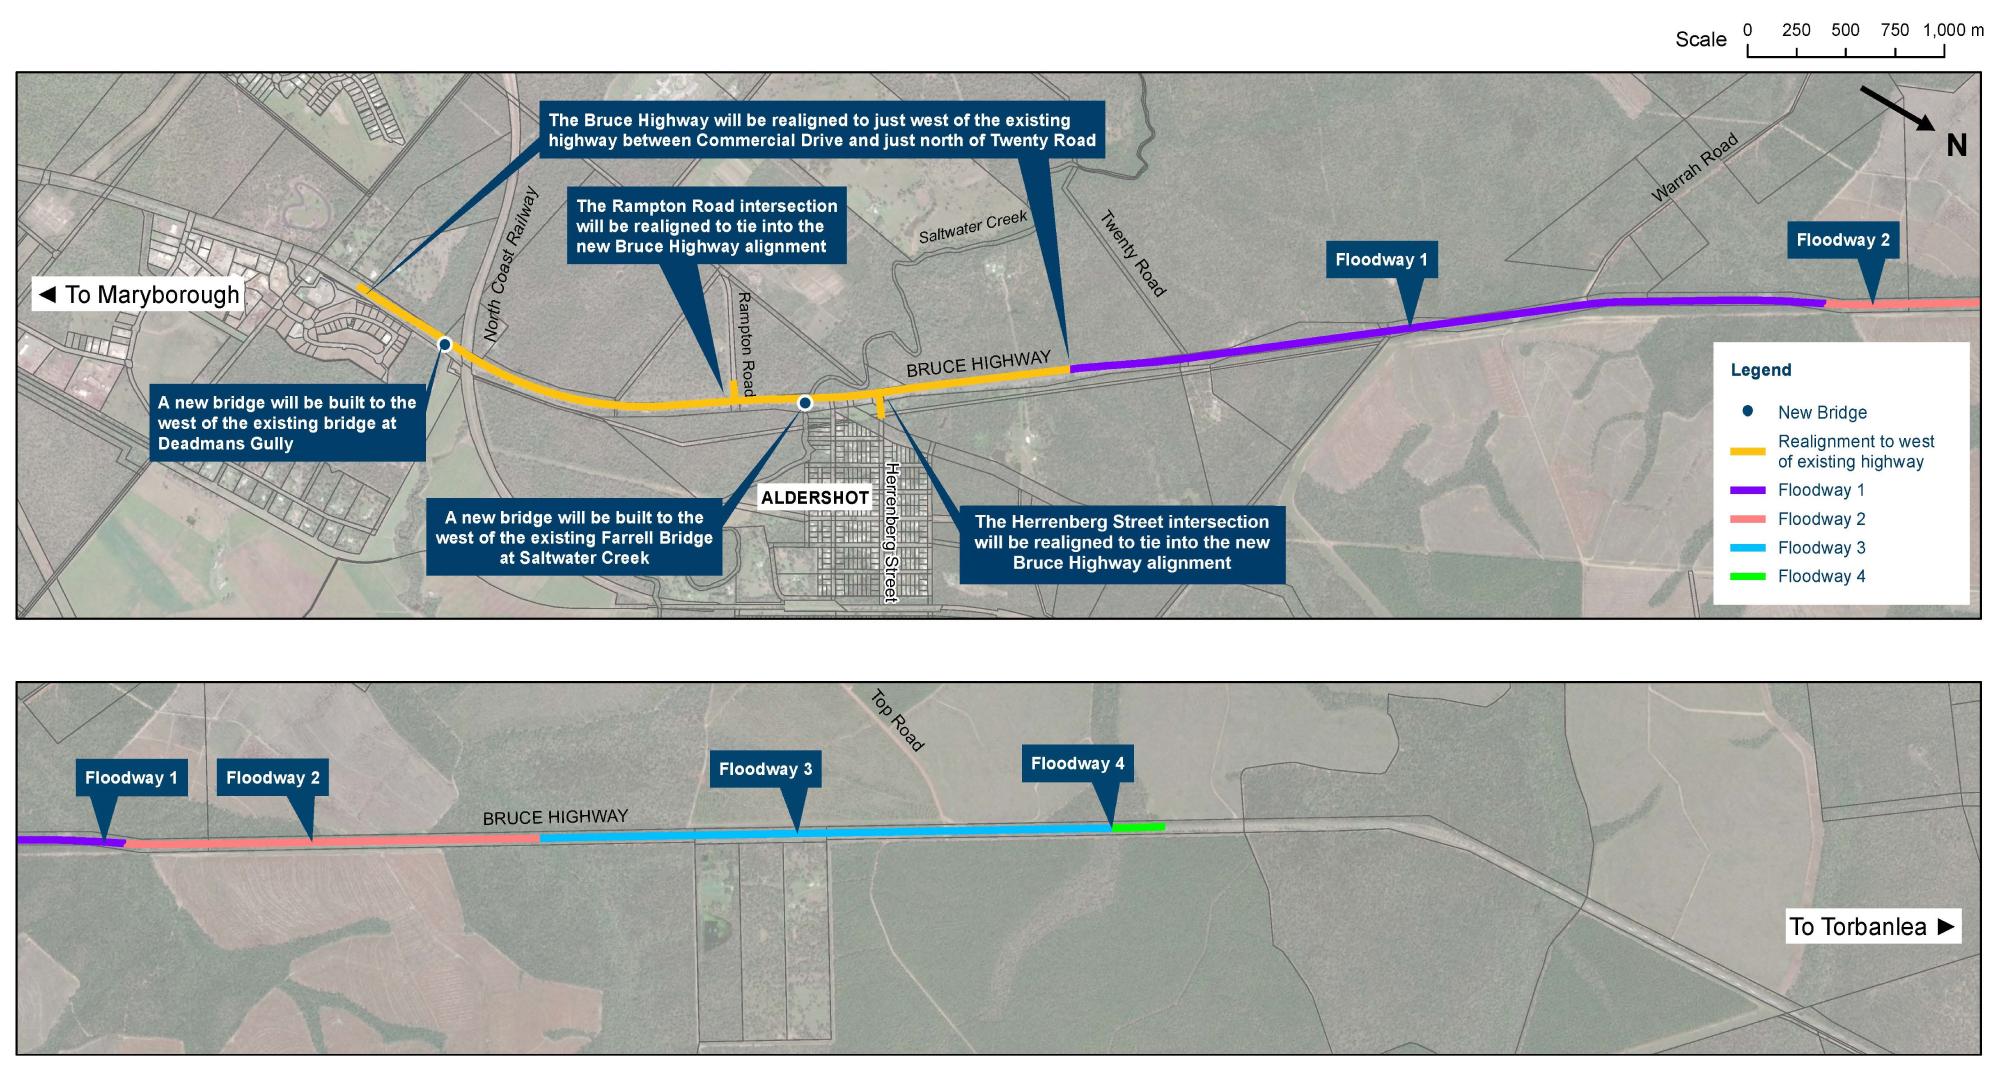 Bruce Highway - Saltwater Creek upgrades webpage image (1)